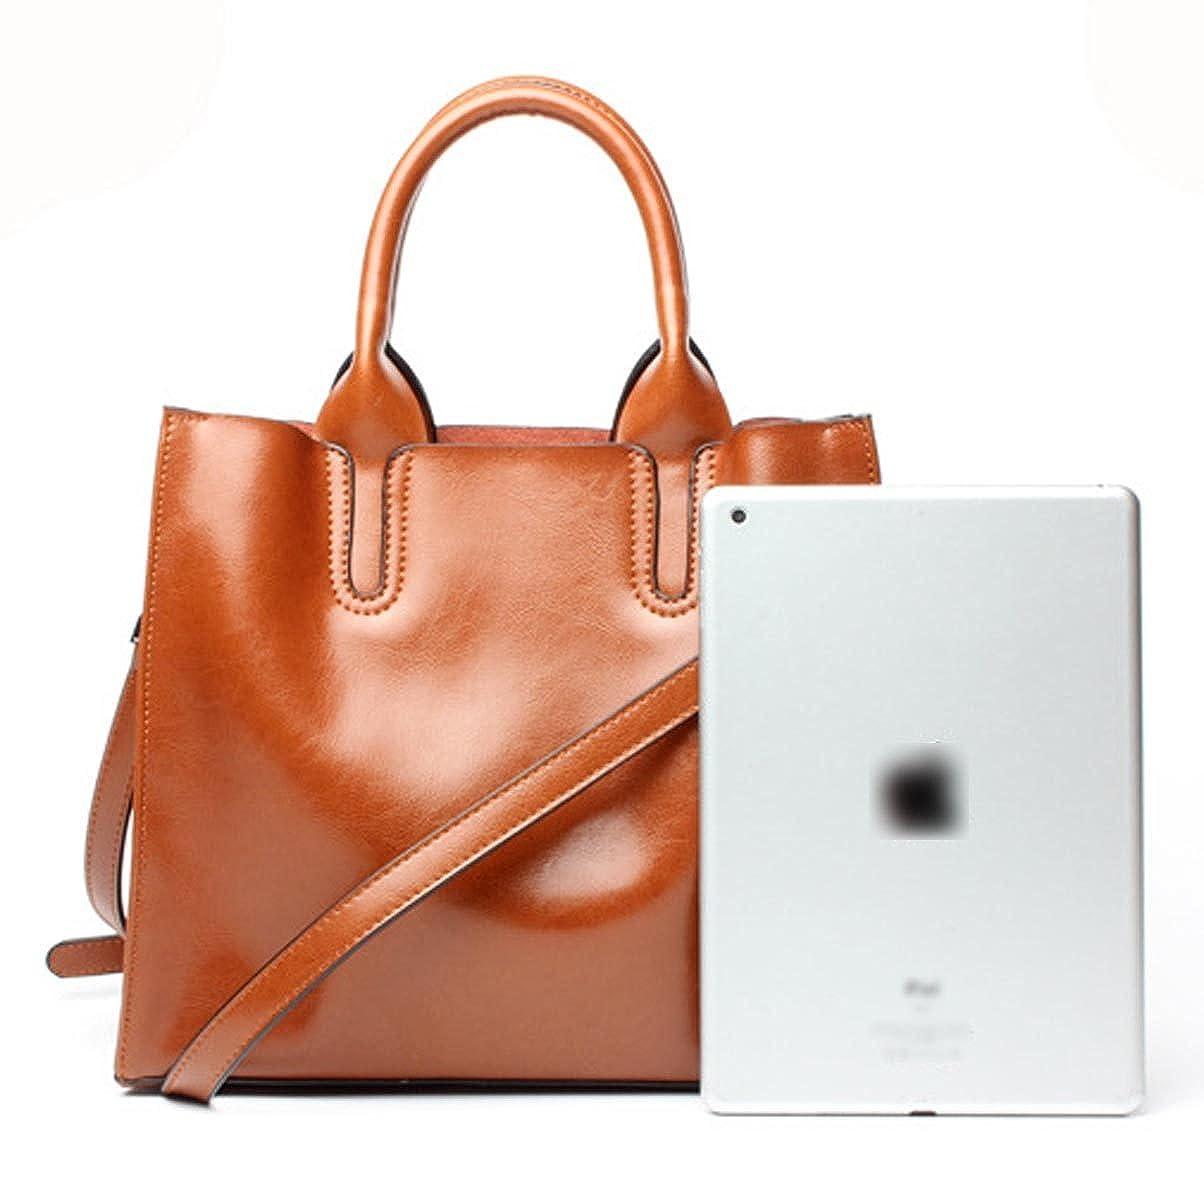 Woman New PU Trend Fashion Large Capacity Tote Bag Single Shoulder Bag Handbag